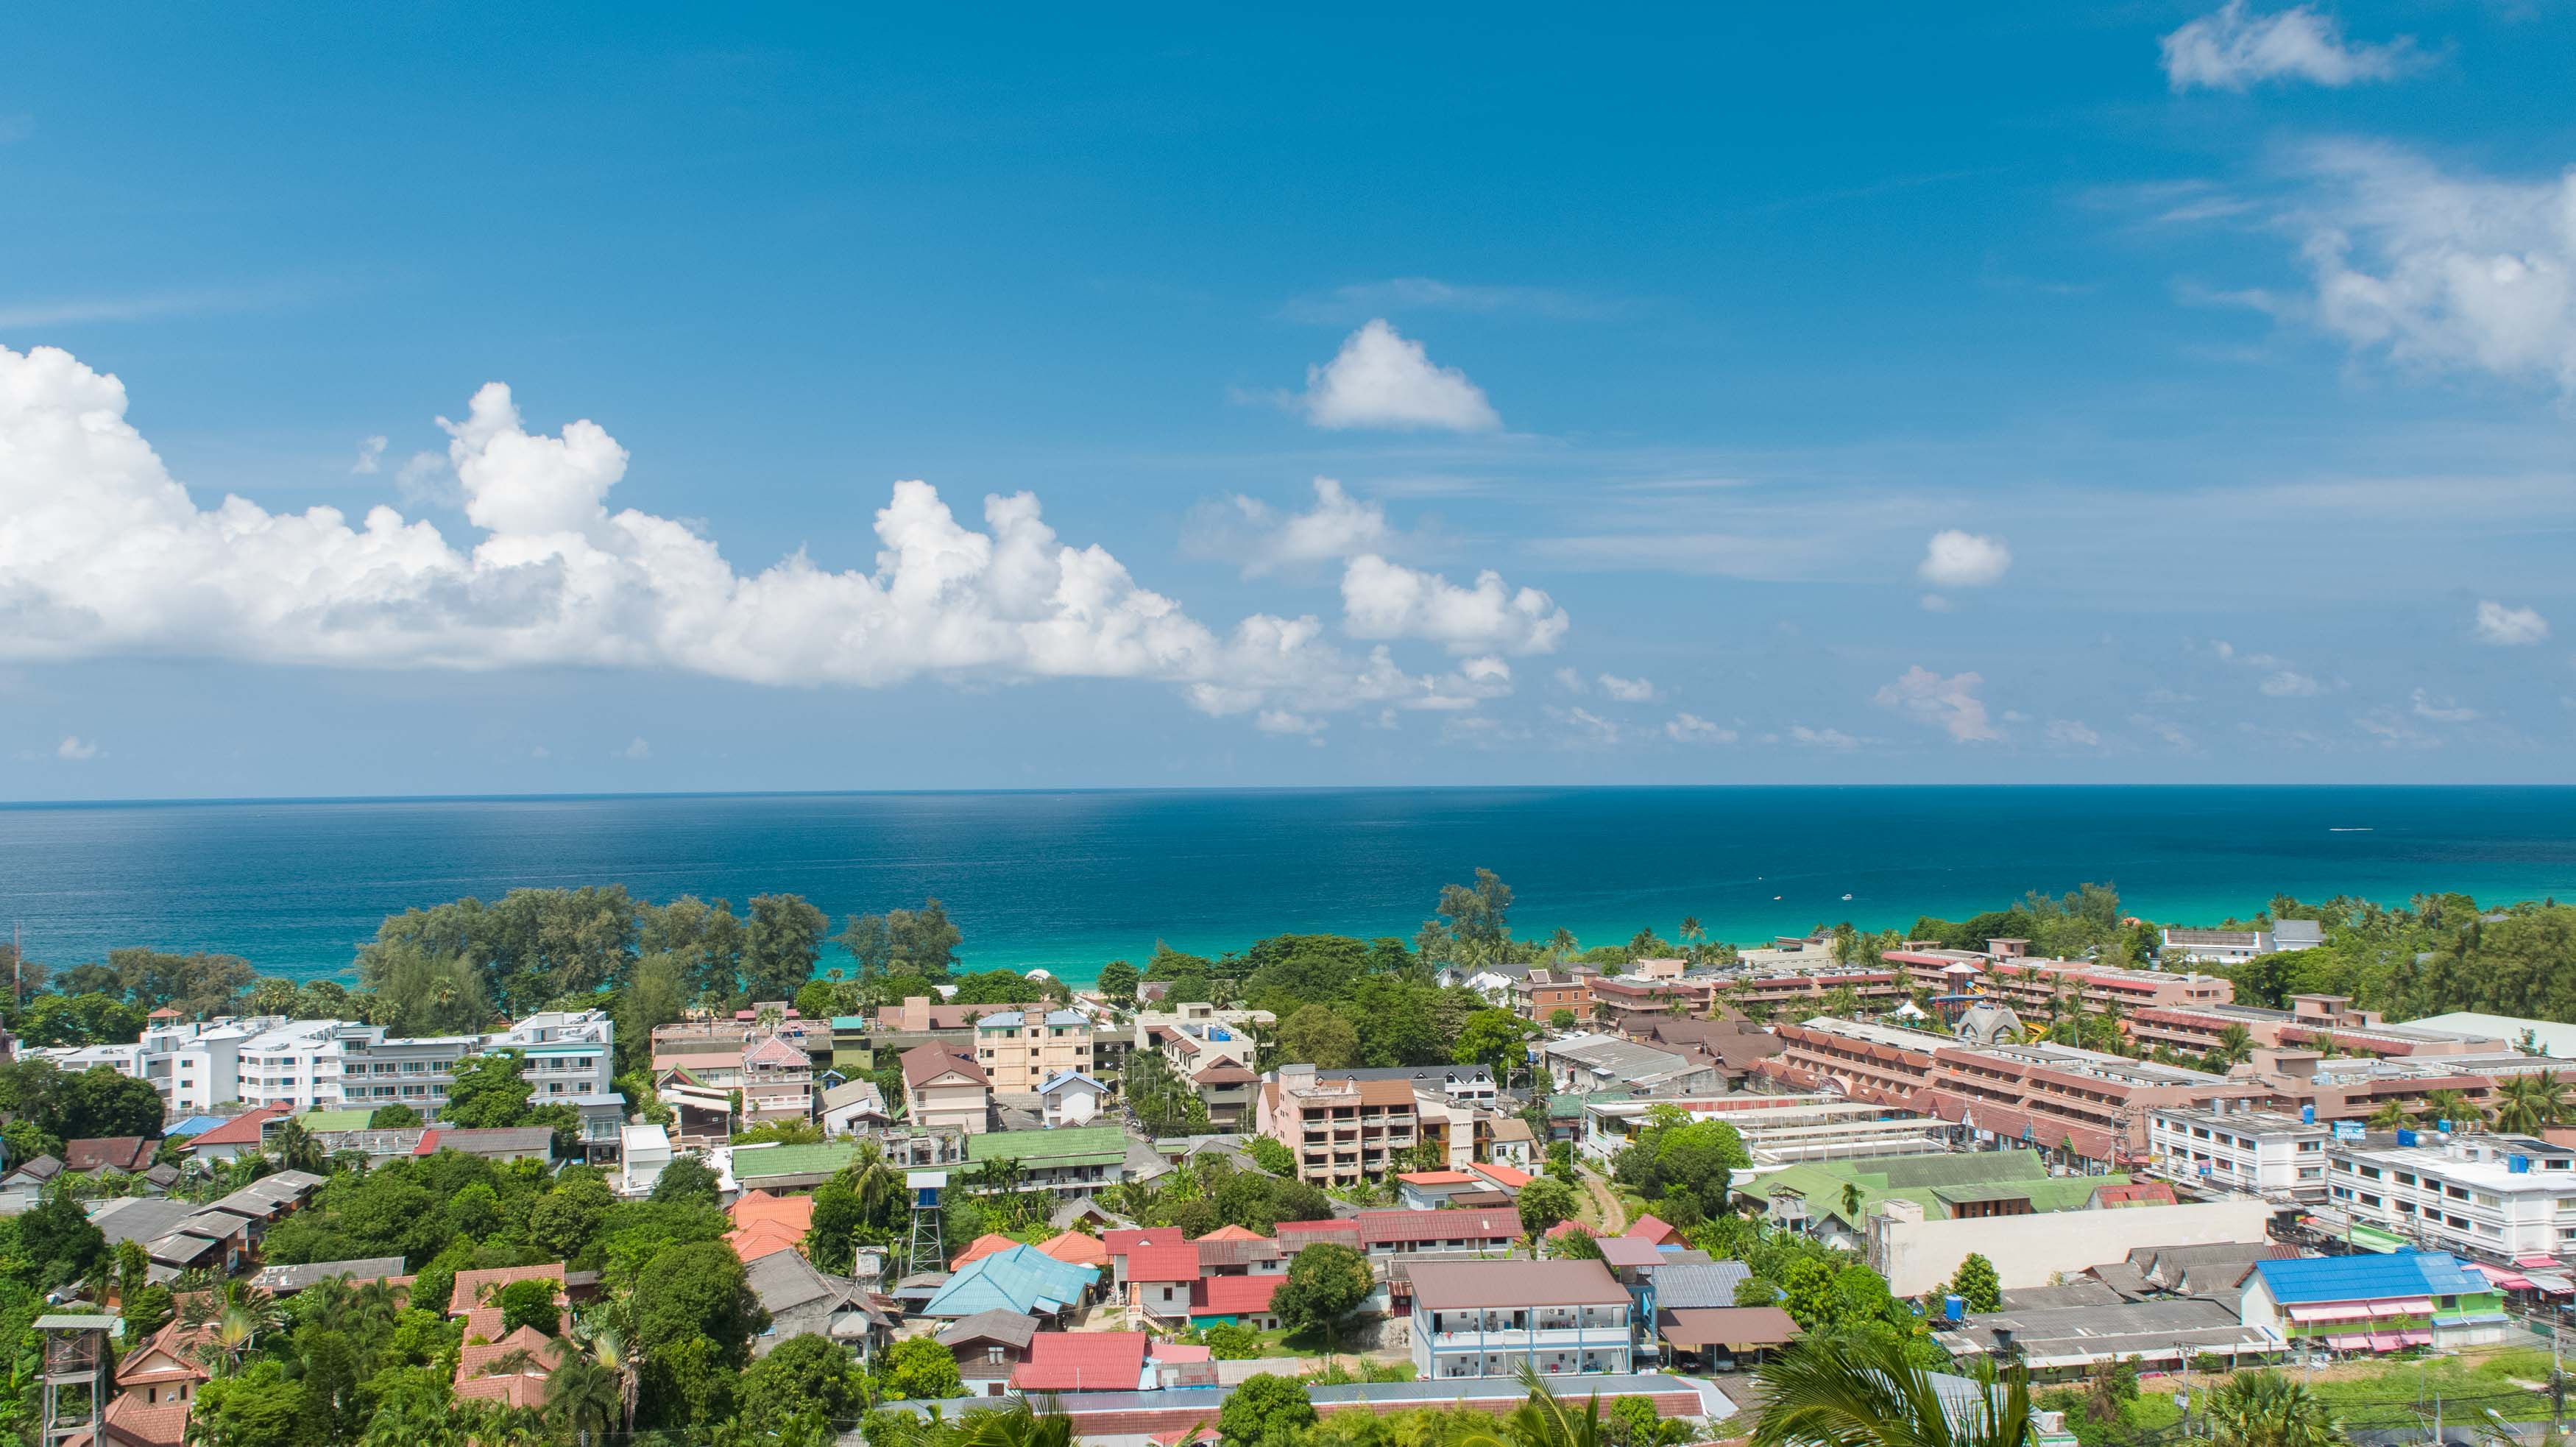 vipkaron phuket view